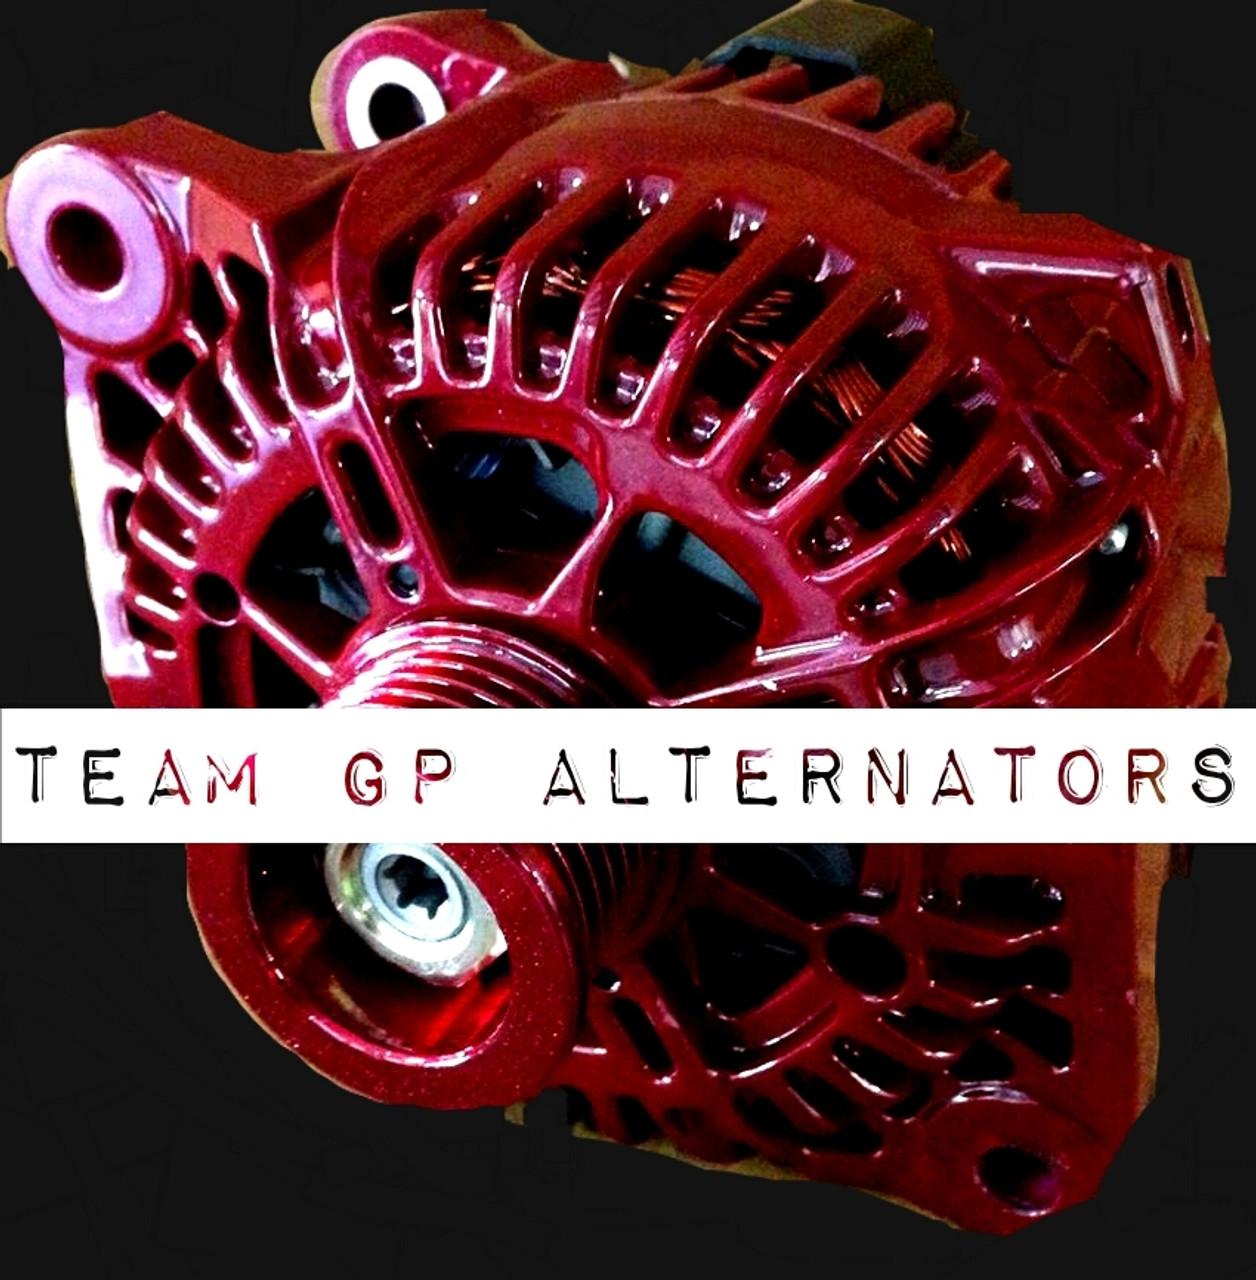 MITSUBISHI ECLIPSE 2.0L -1995-1999- 180 AMP TEAM GP Alternator